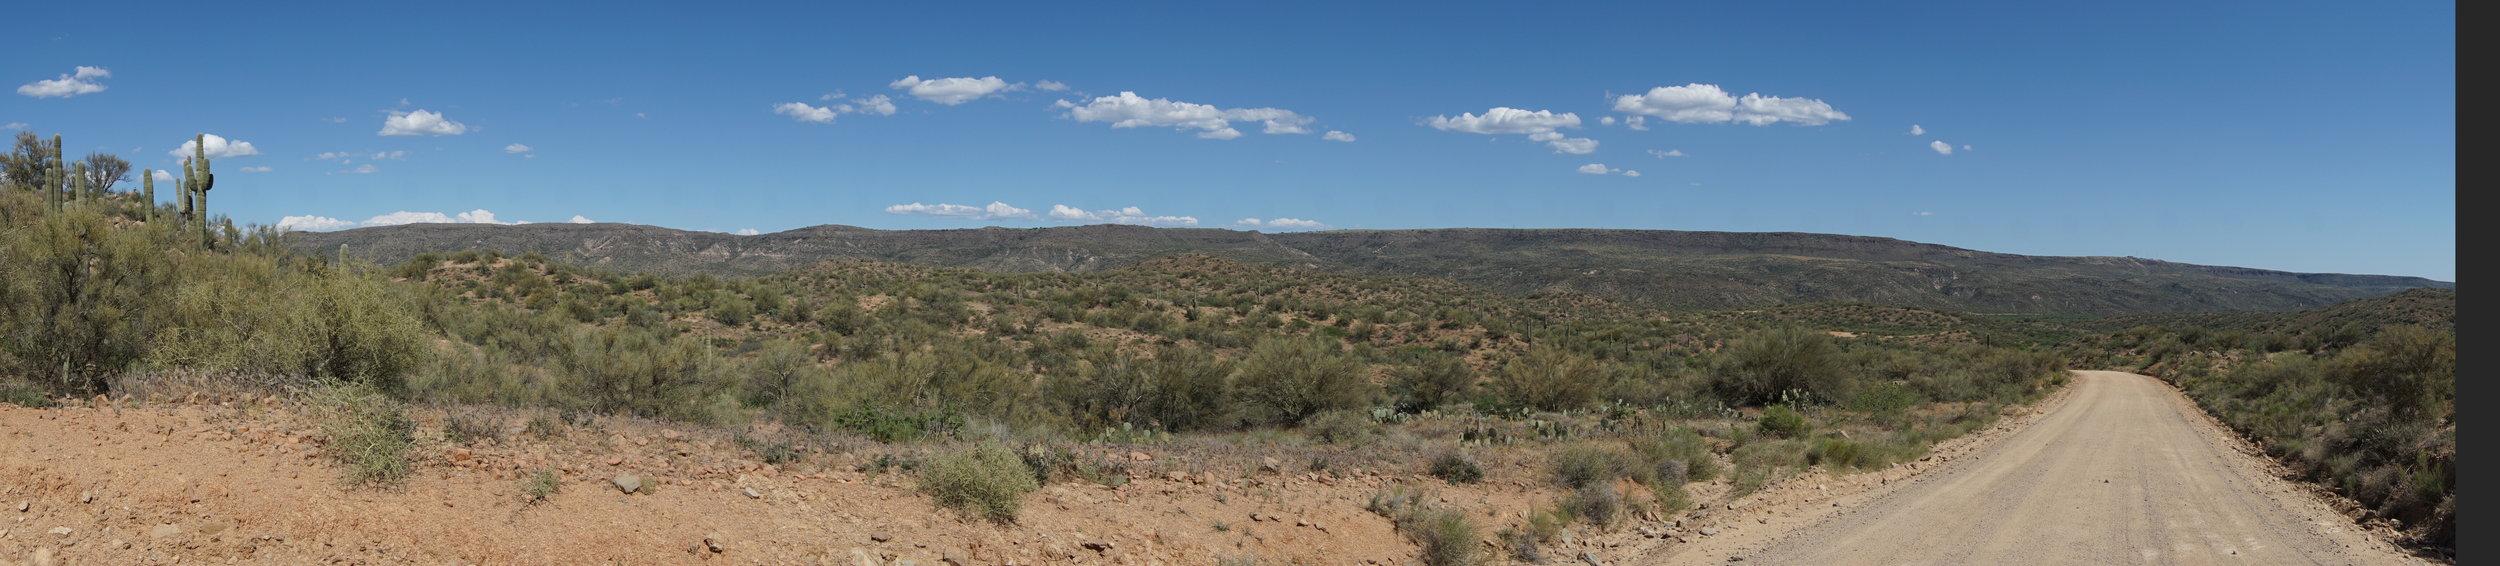 Mogollon Ridge from the Alki Canyon outside of Bumble Bee AZ